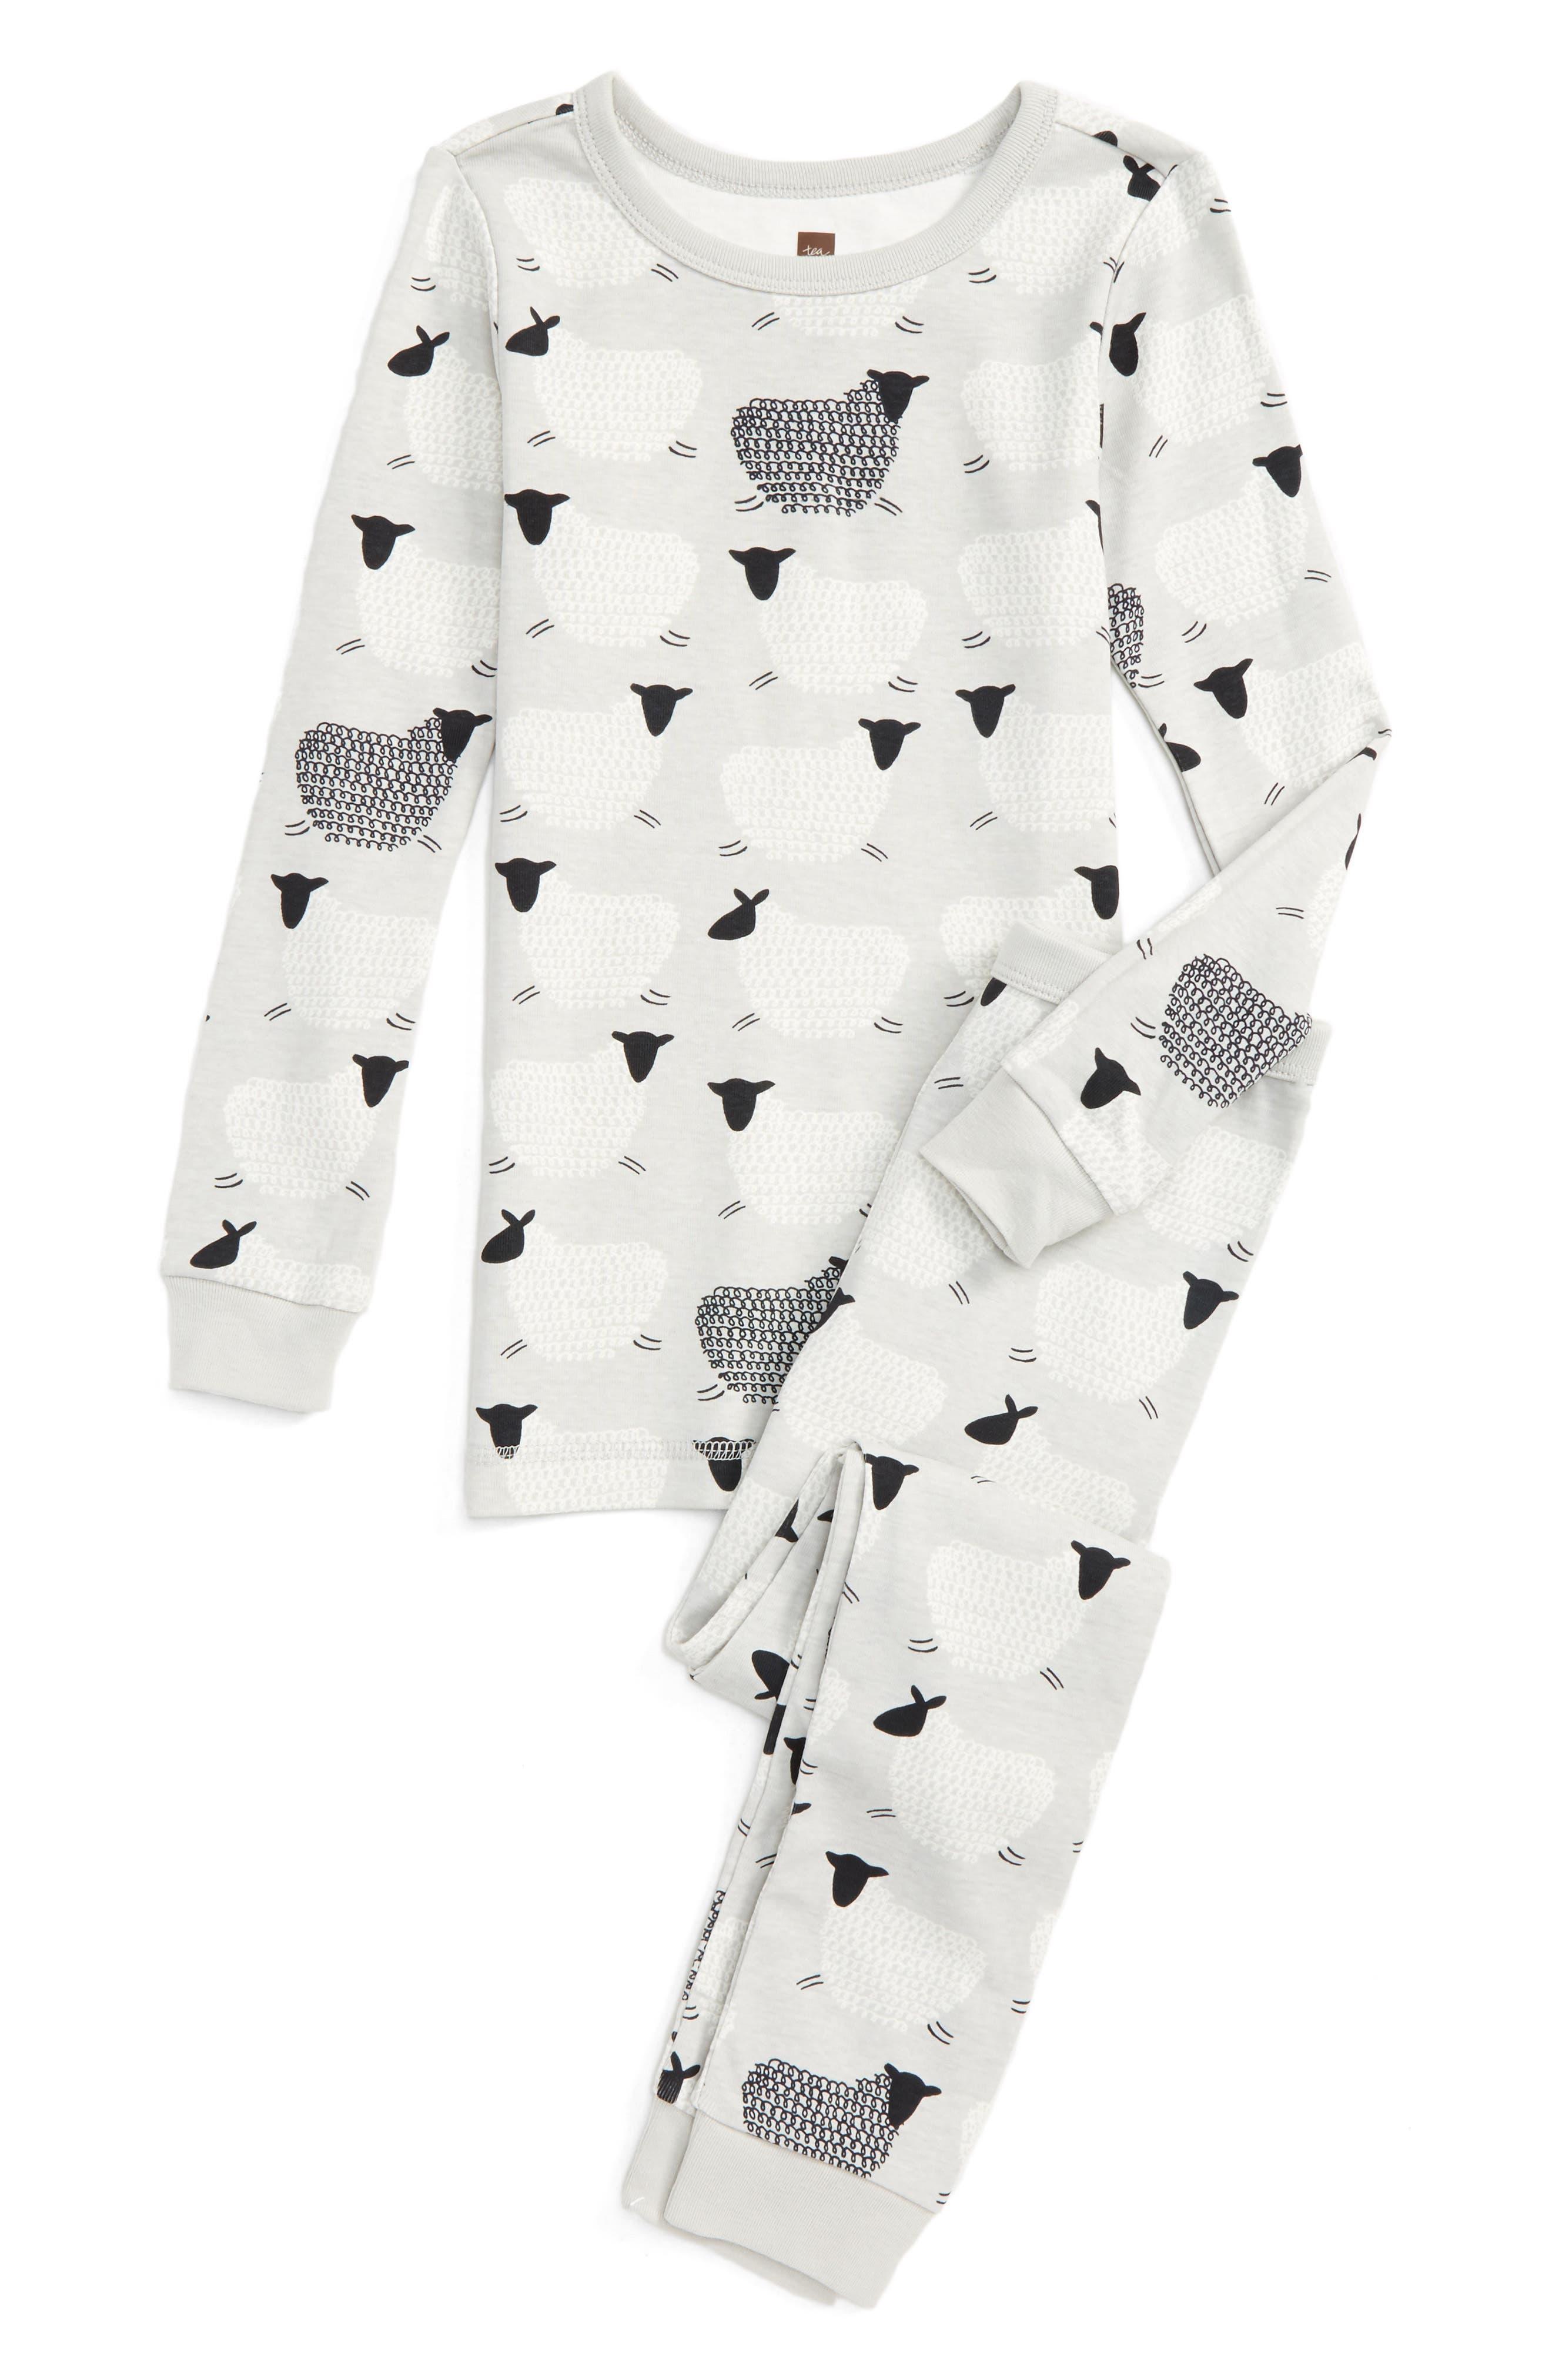 Main Image - Tea Collection Baa Baa Fitted Two-Piece Pajamas (Toddler Girls, Little Girls & Big Girls)